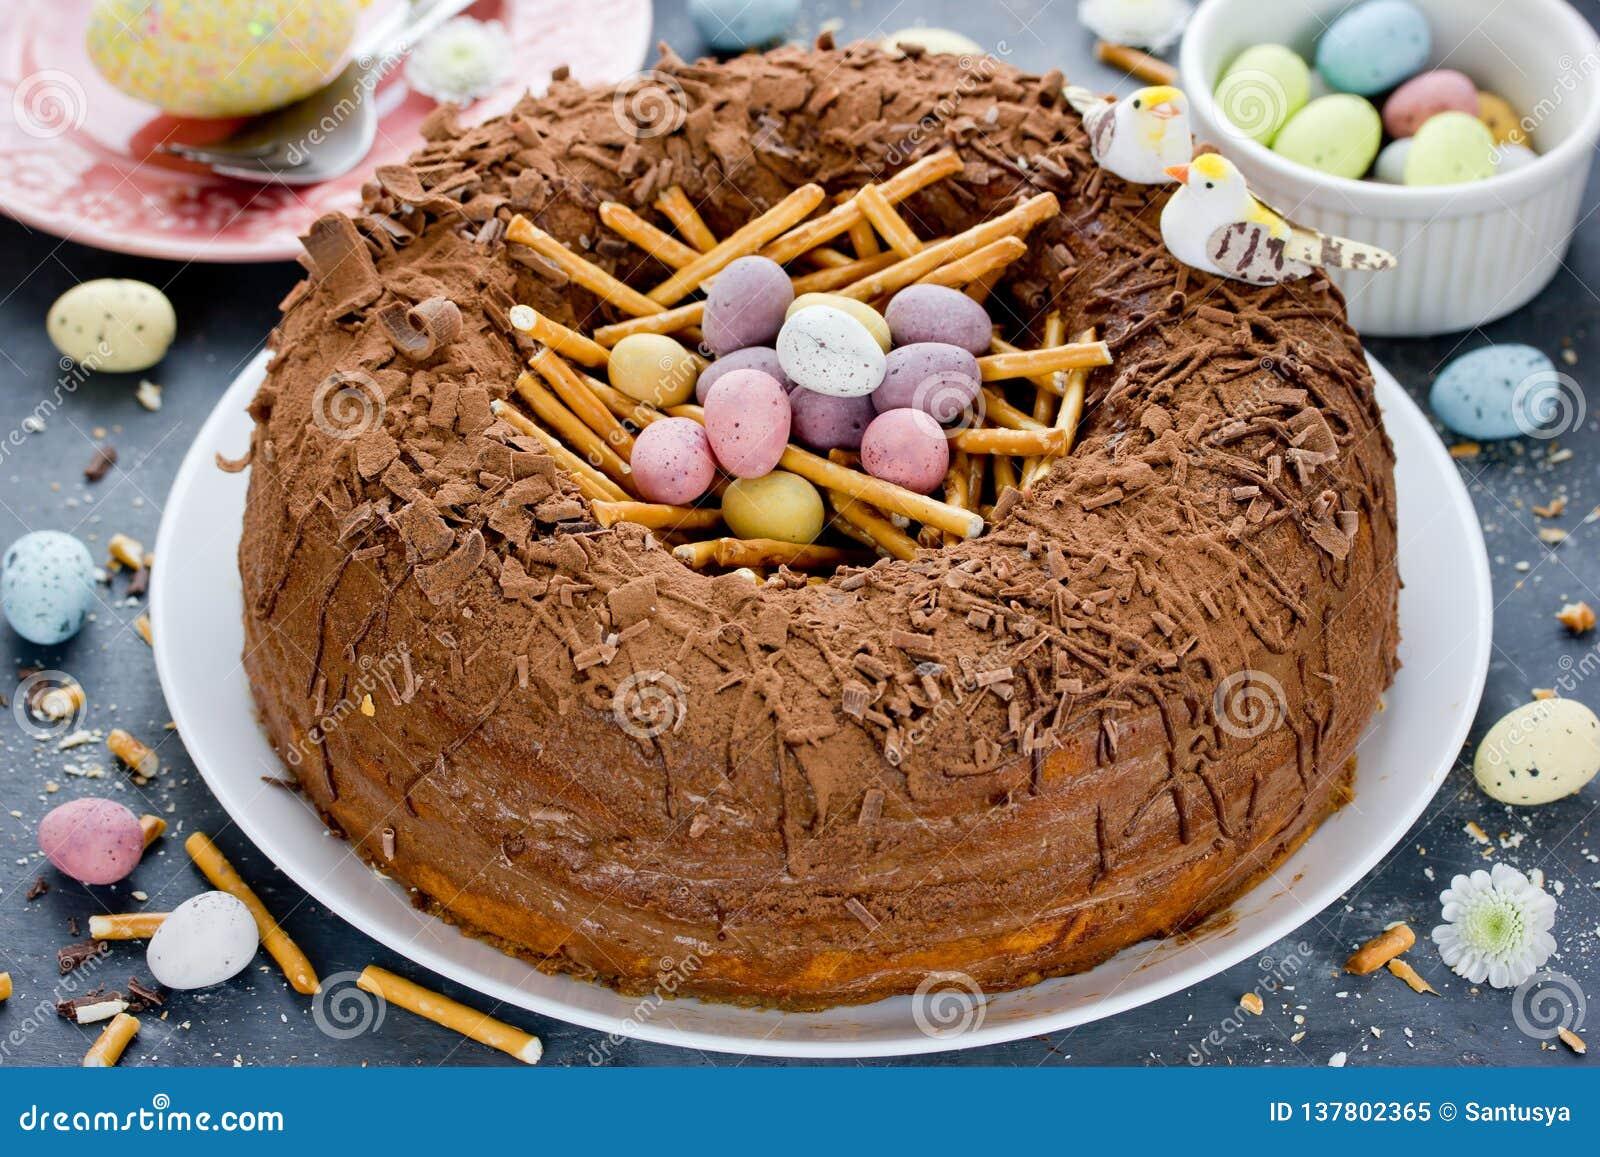 Easter Egg Nest Cake Stock Image Image Of Brunch Frosting 137802365